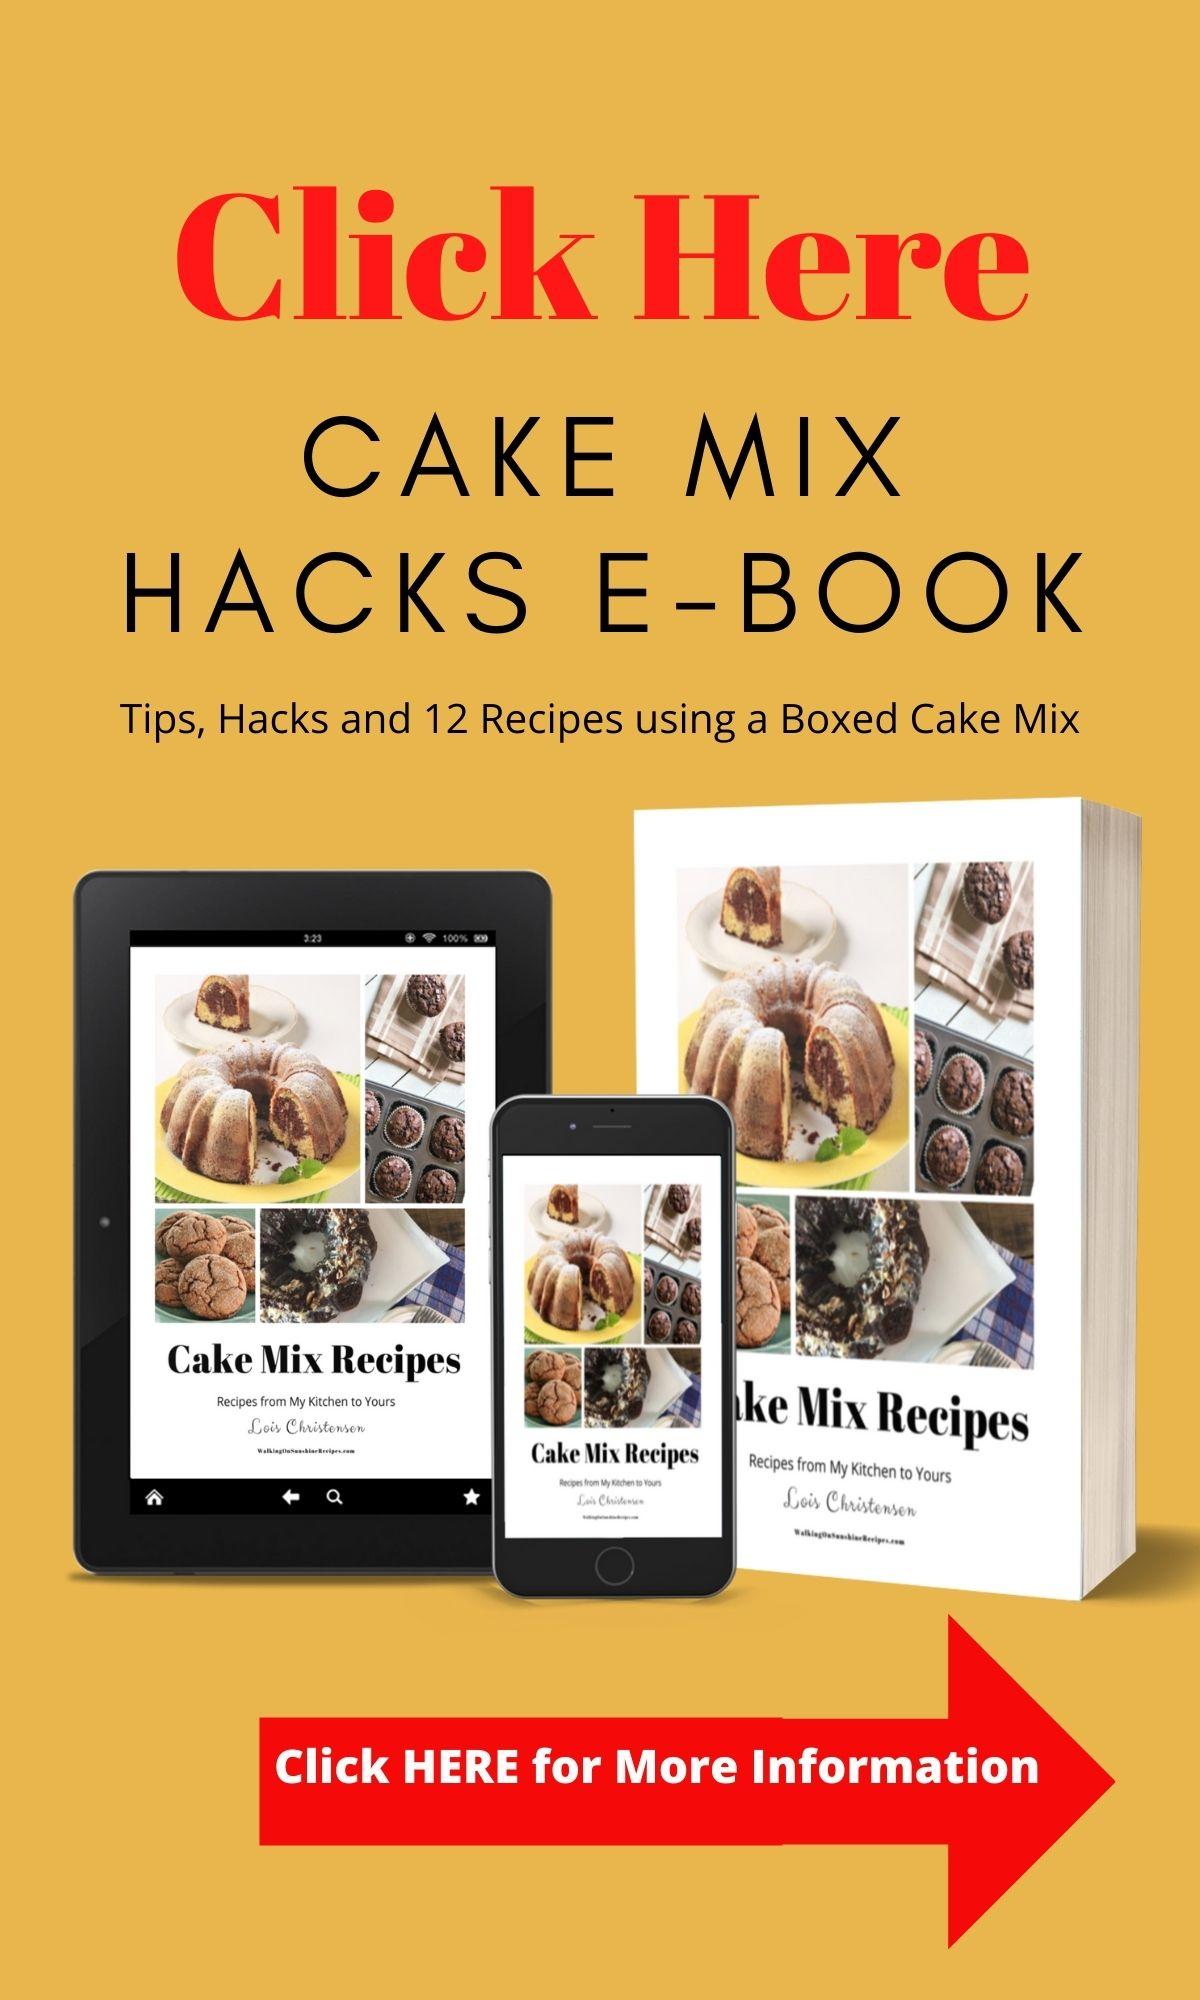 Cake-Mix-ebook-ggnoads.png LONG Blog Promo